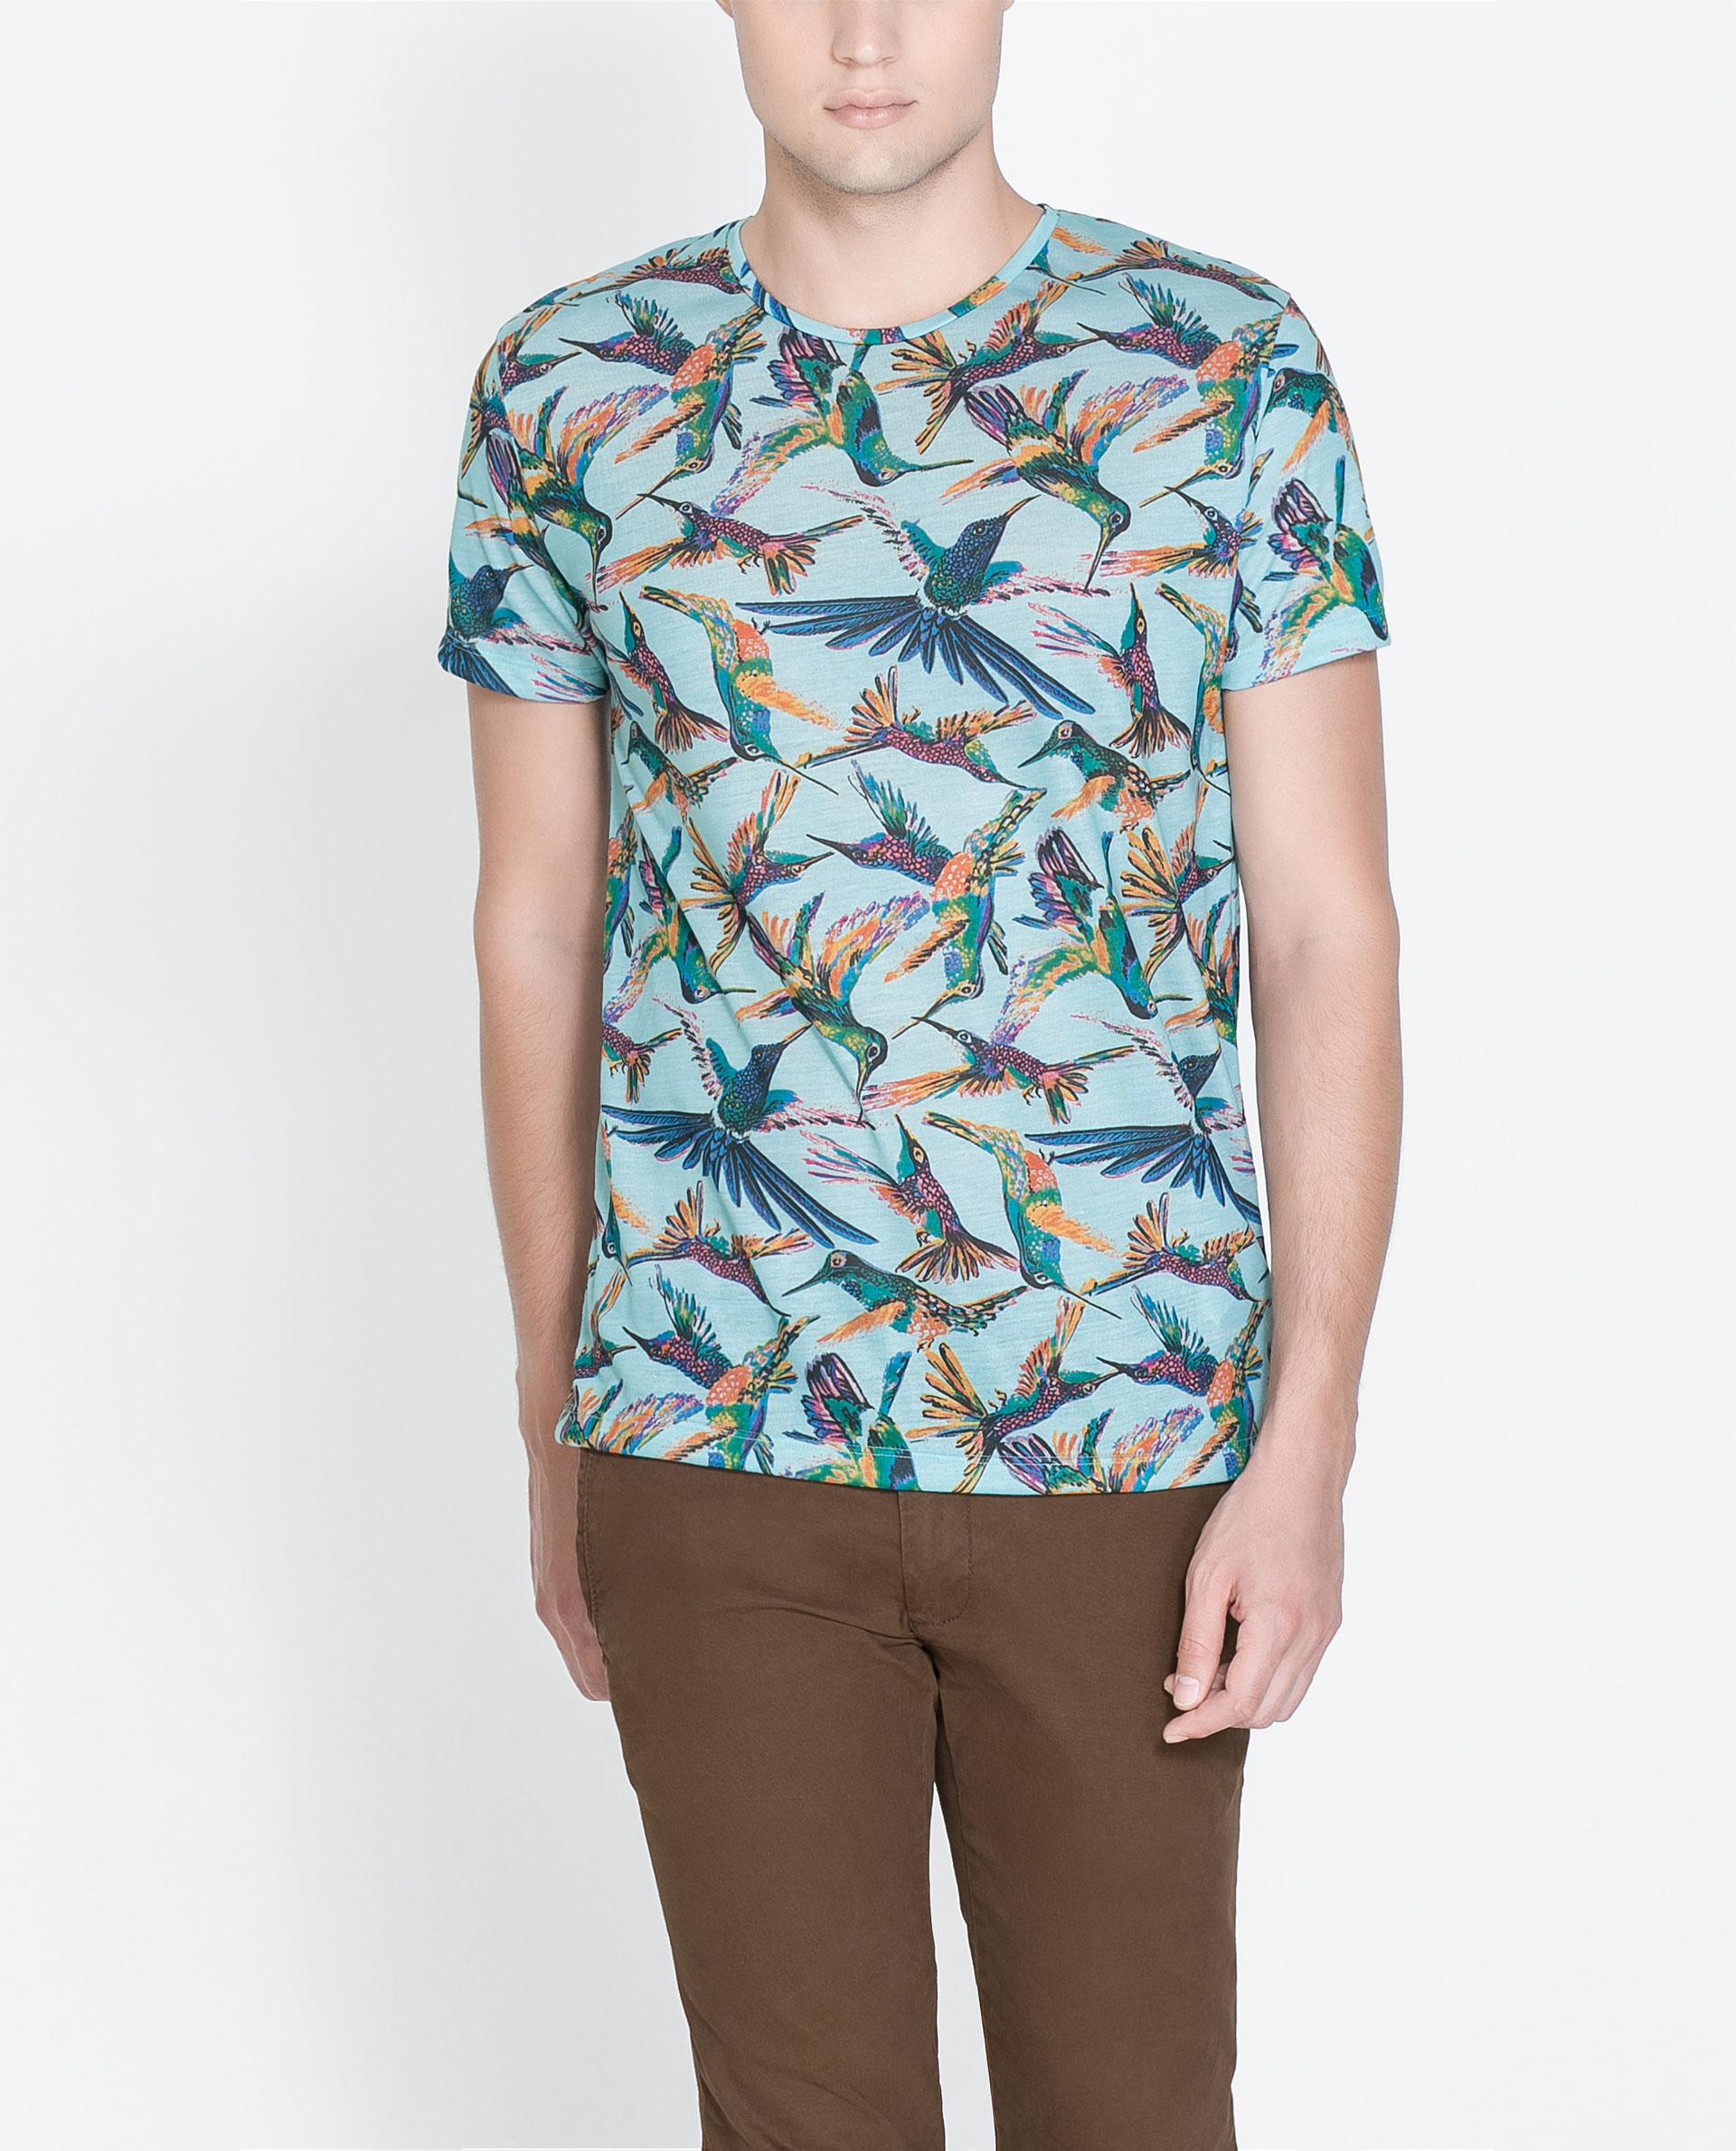 Zara hummingbird tshirt in blue for men turquoise lyst for Zara mens shirts sale